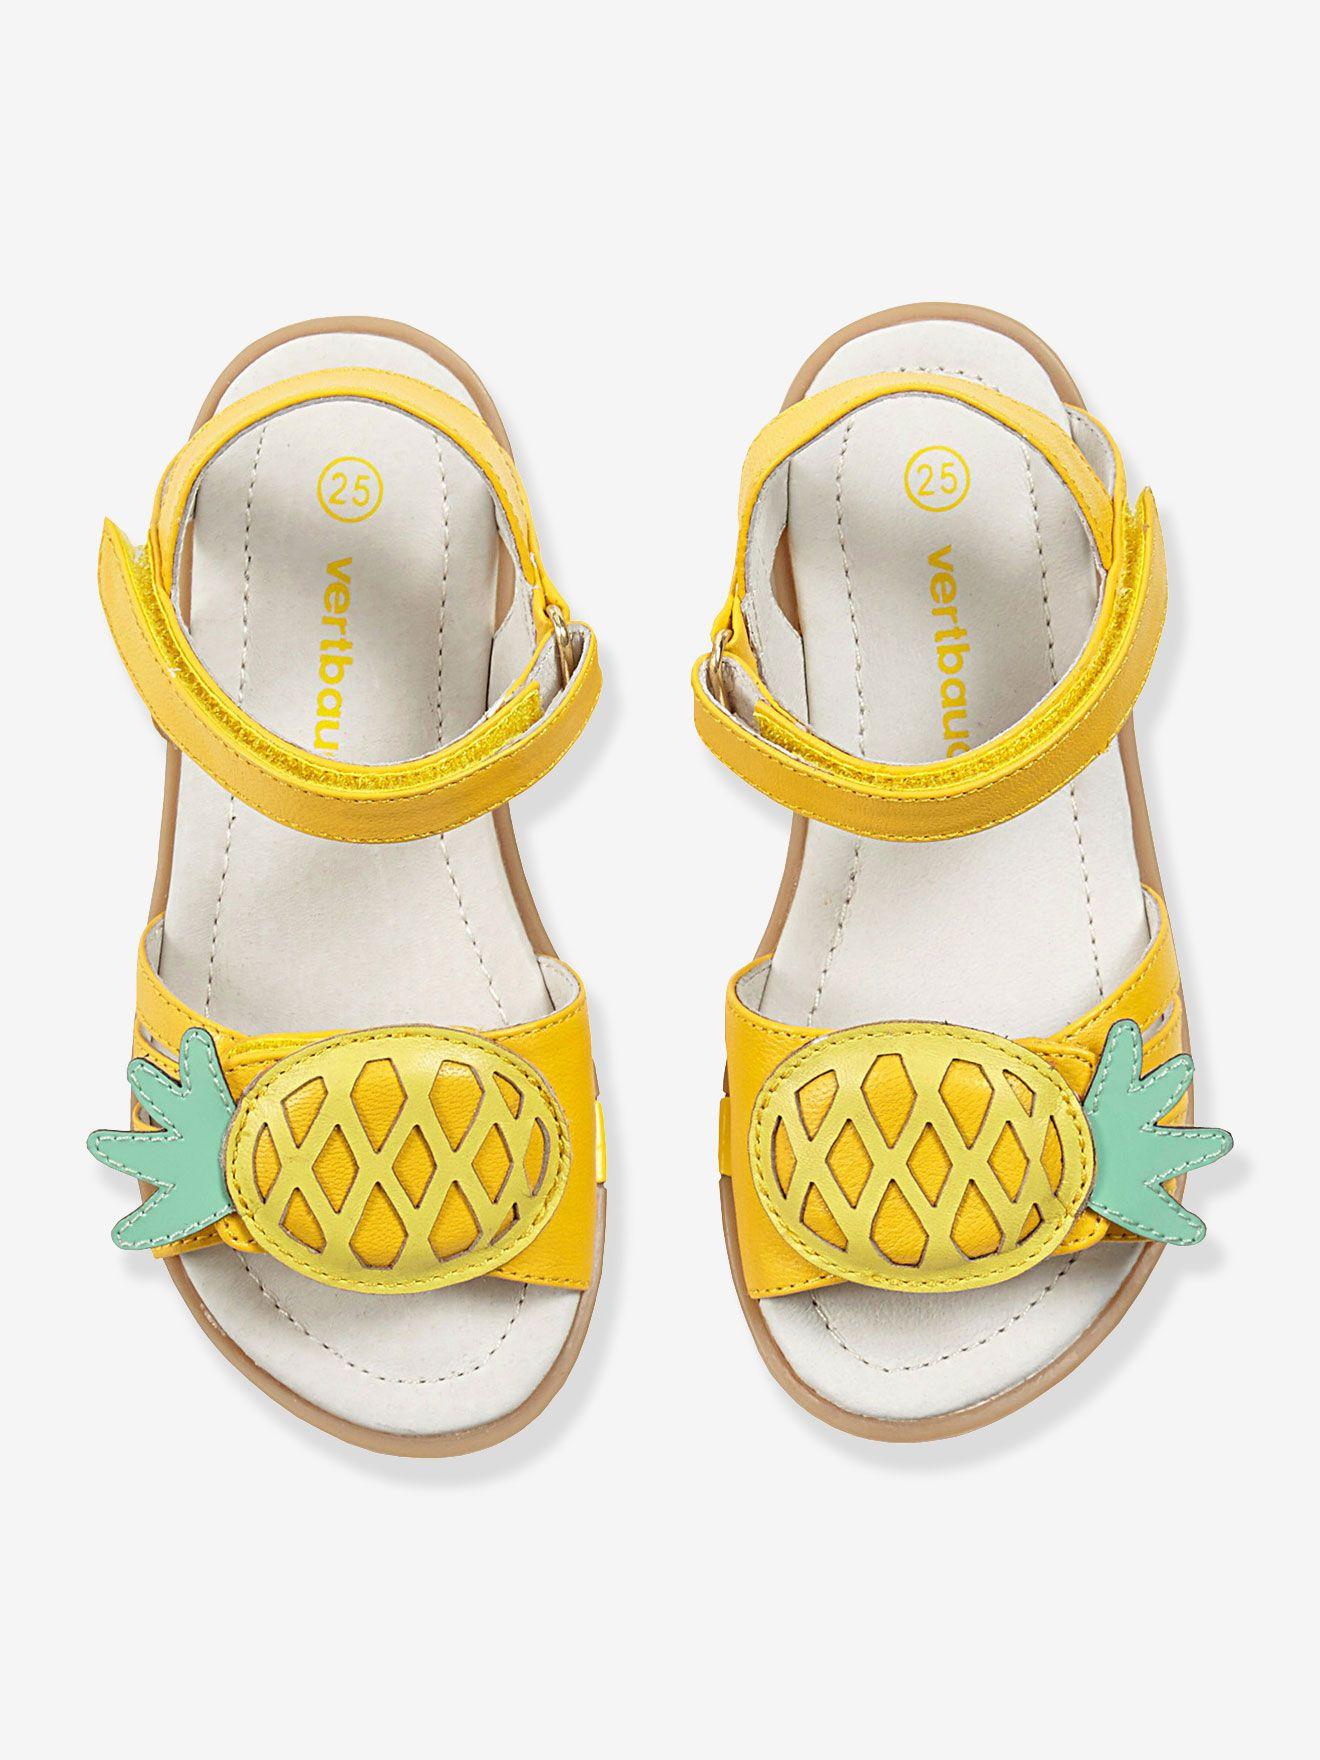 c4ddddd2487 Sandales cuir fille spécial maternelle jaune - Vertbaudet. Sandales cuir  fille spécial maternelle jaune - Vertbaudet Calçados Para Bebe ...